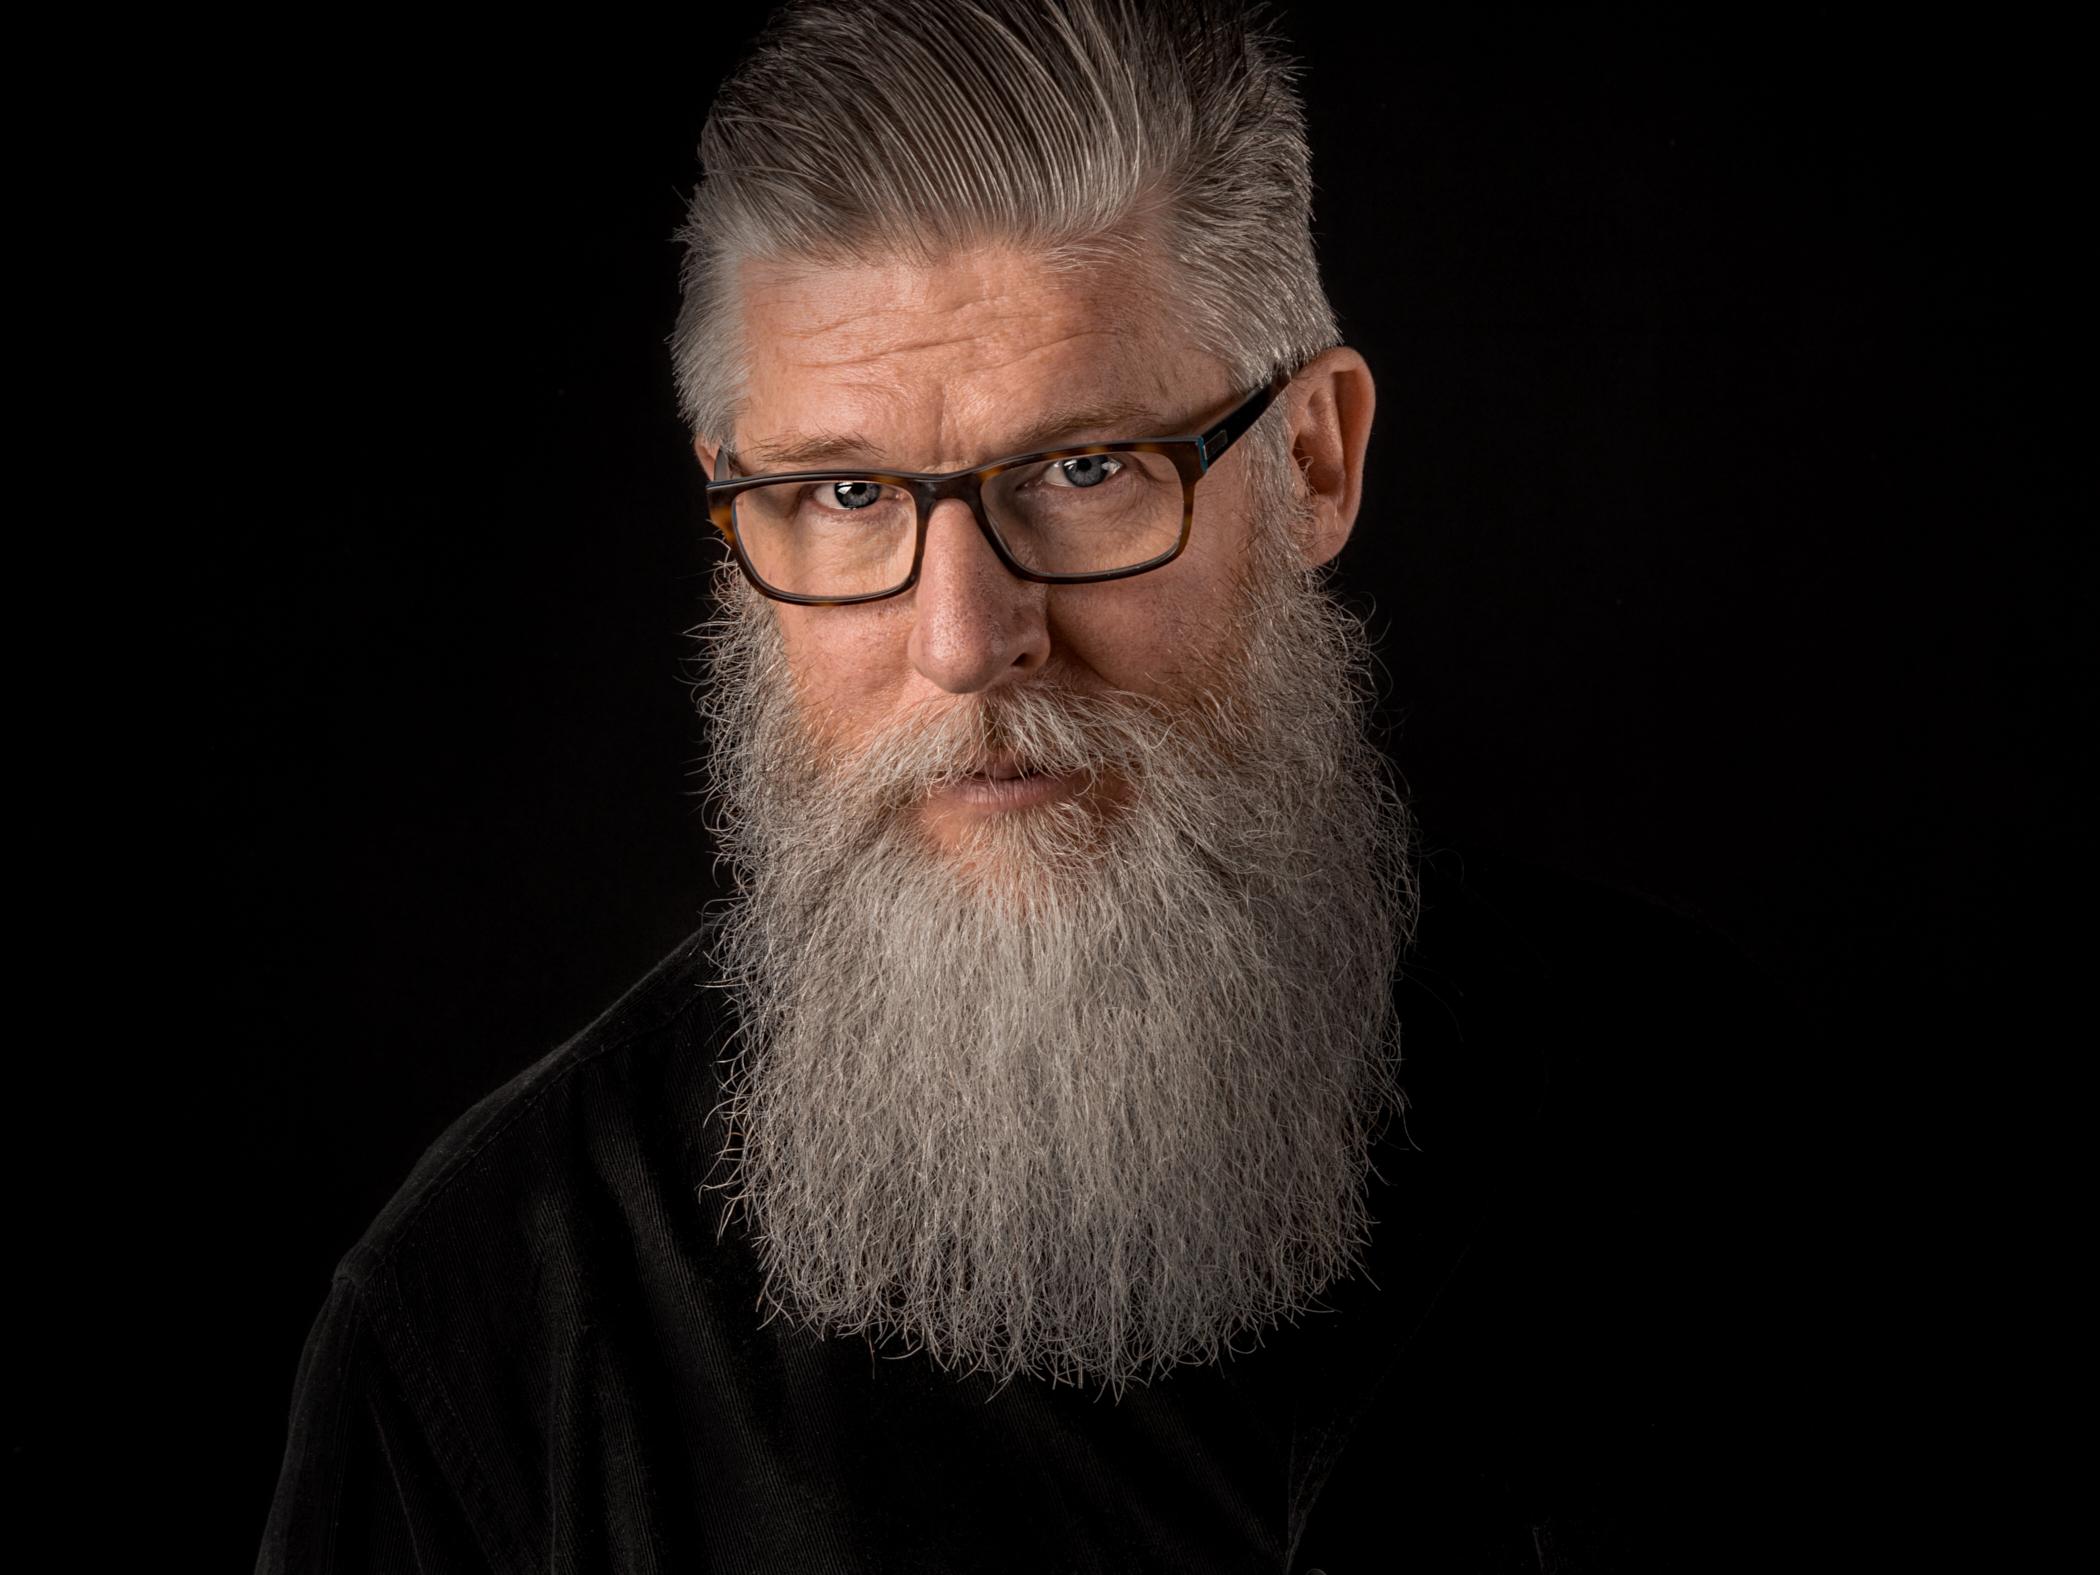 Gentleman Beard